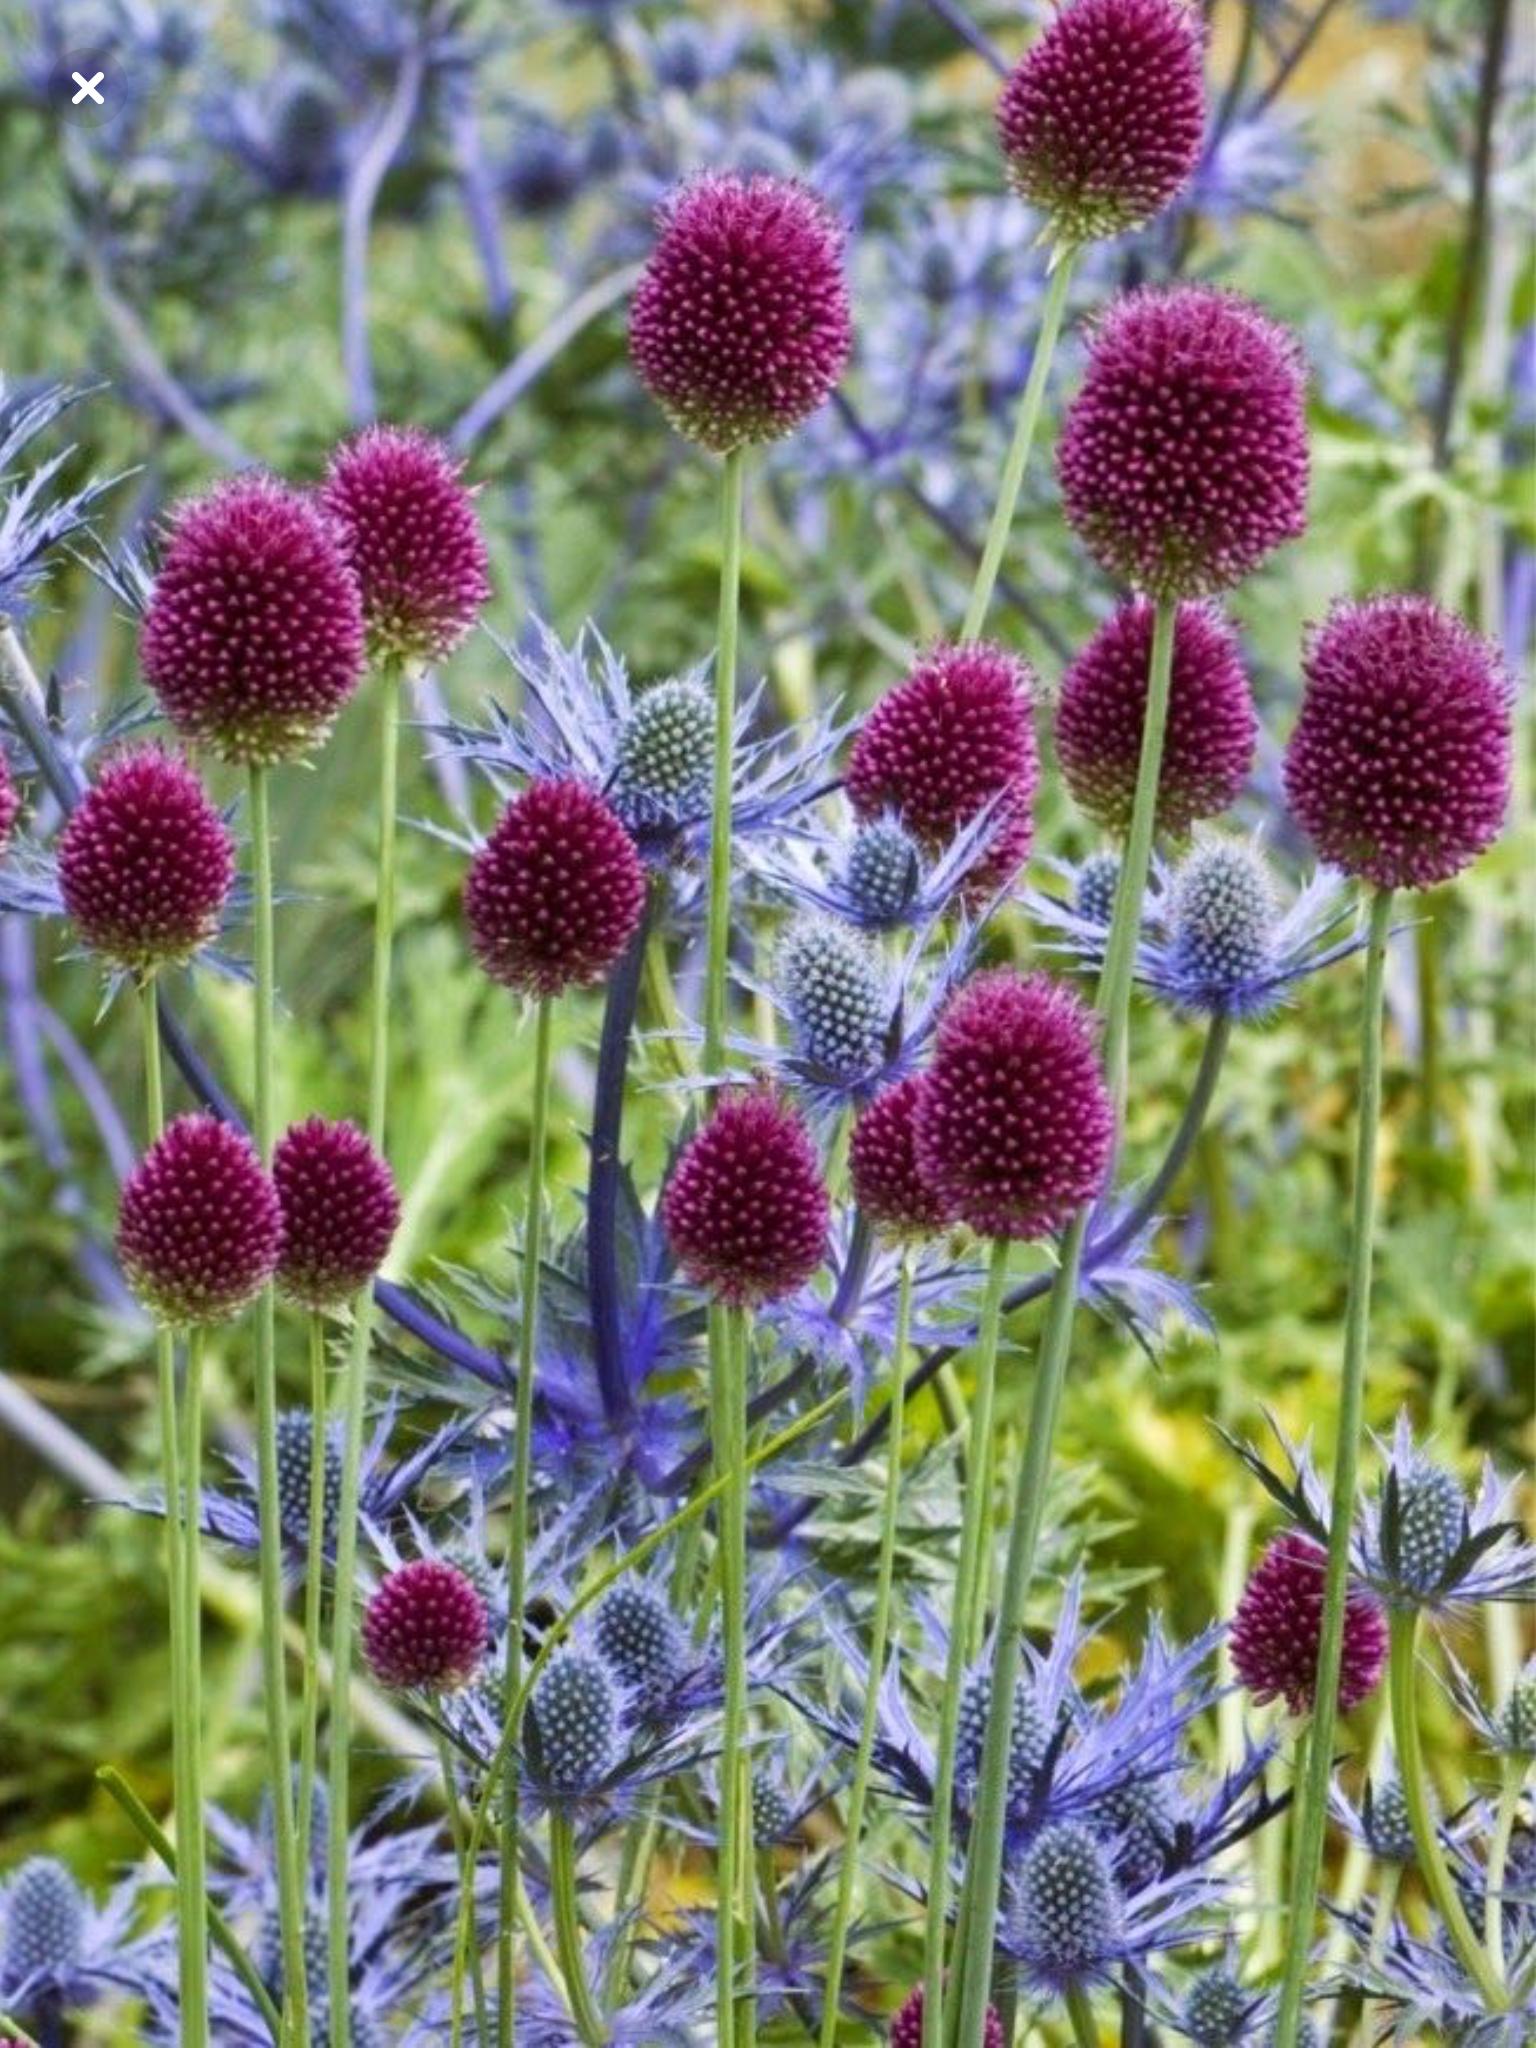 Sea Holly And Drumstick Allium Bulb Flowers Bulbous Plants Plants